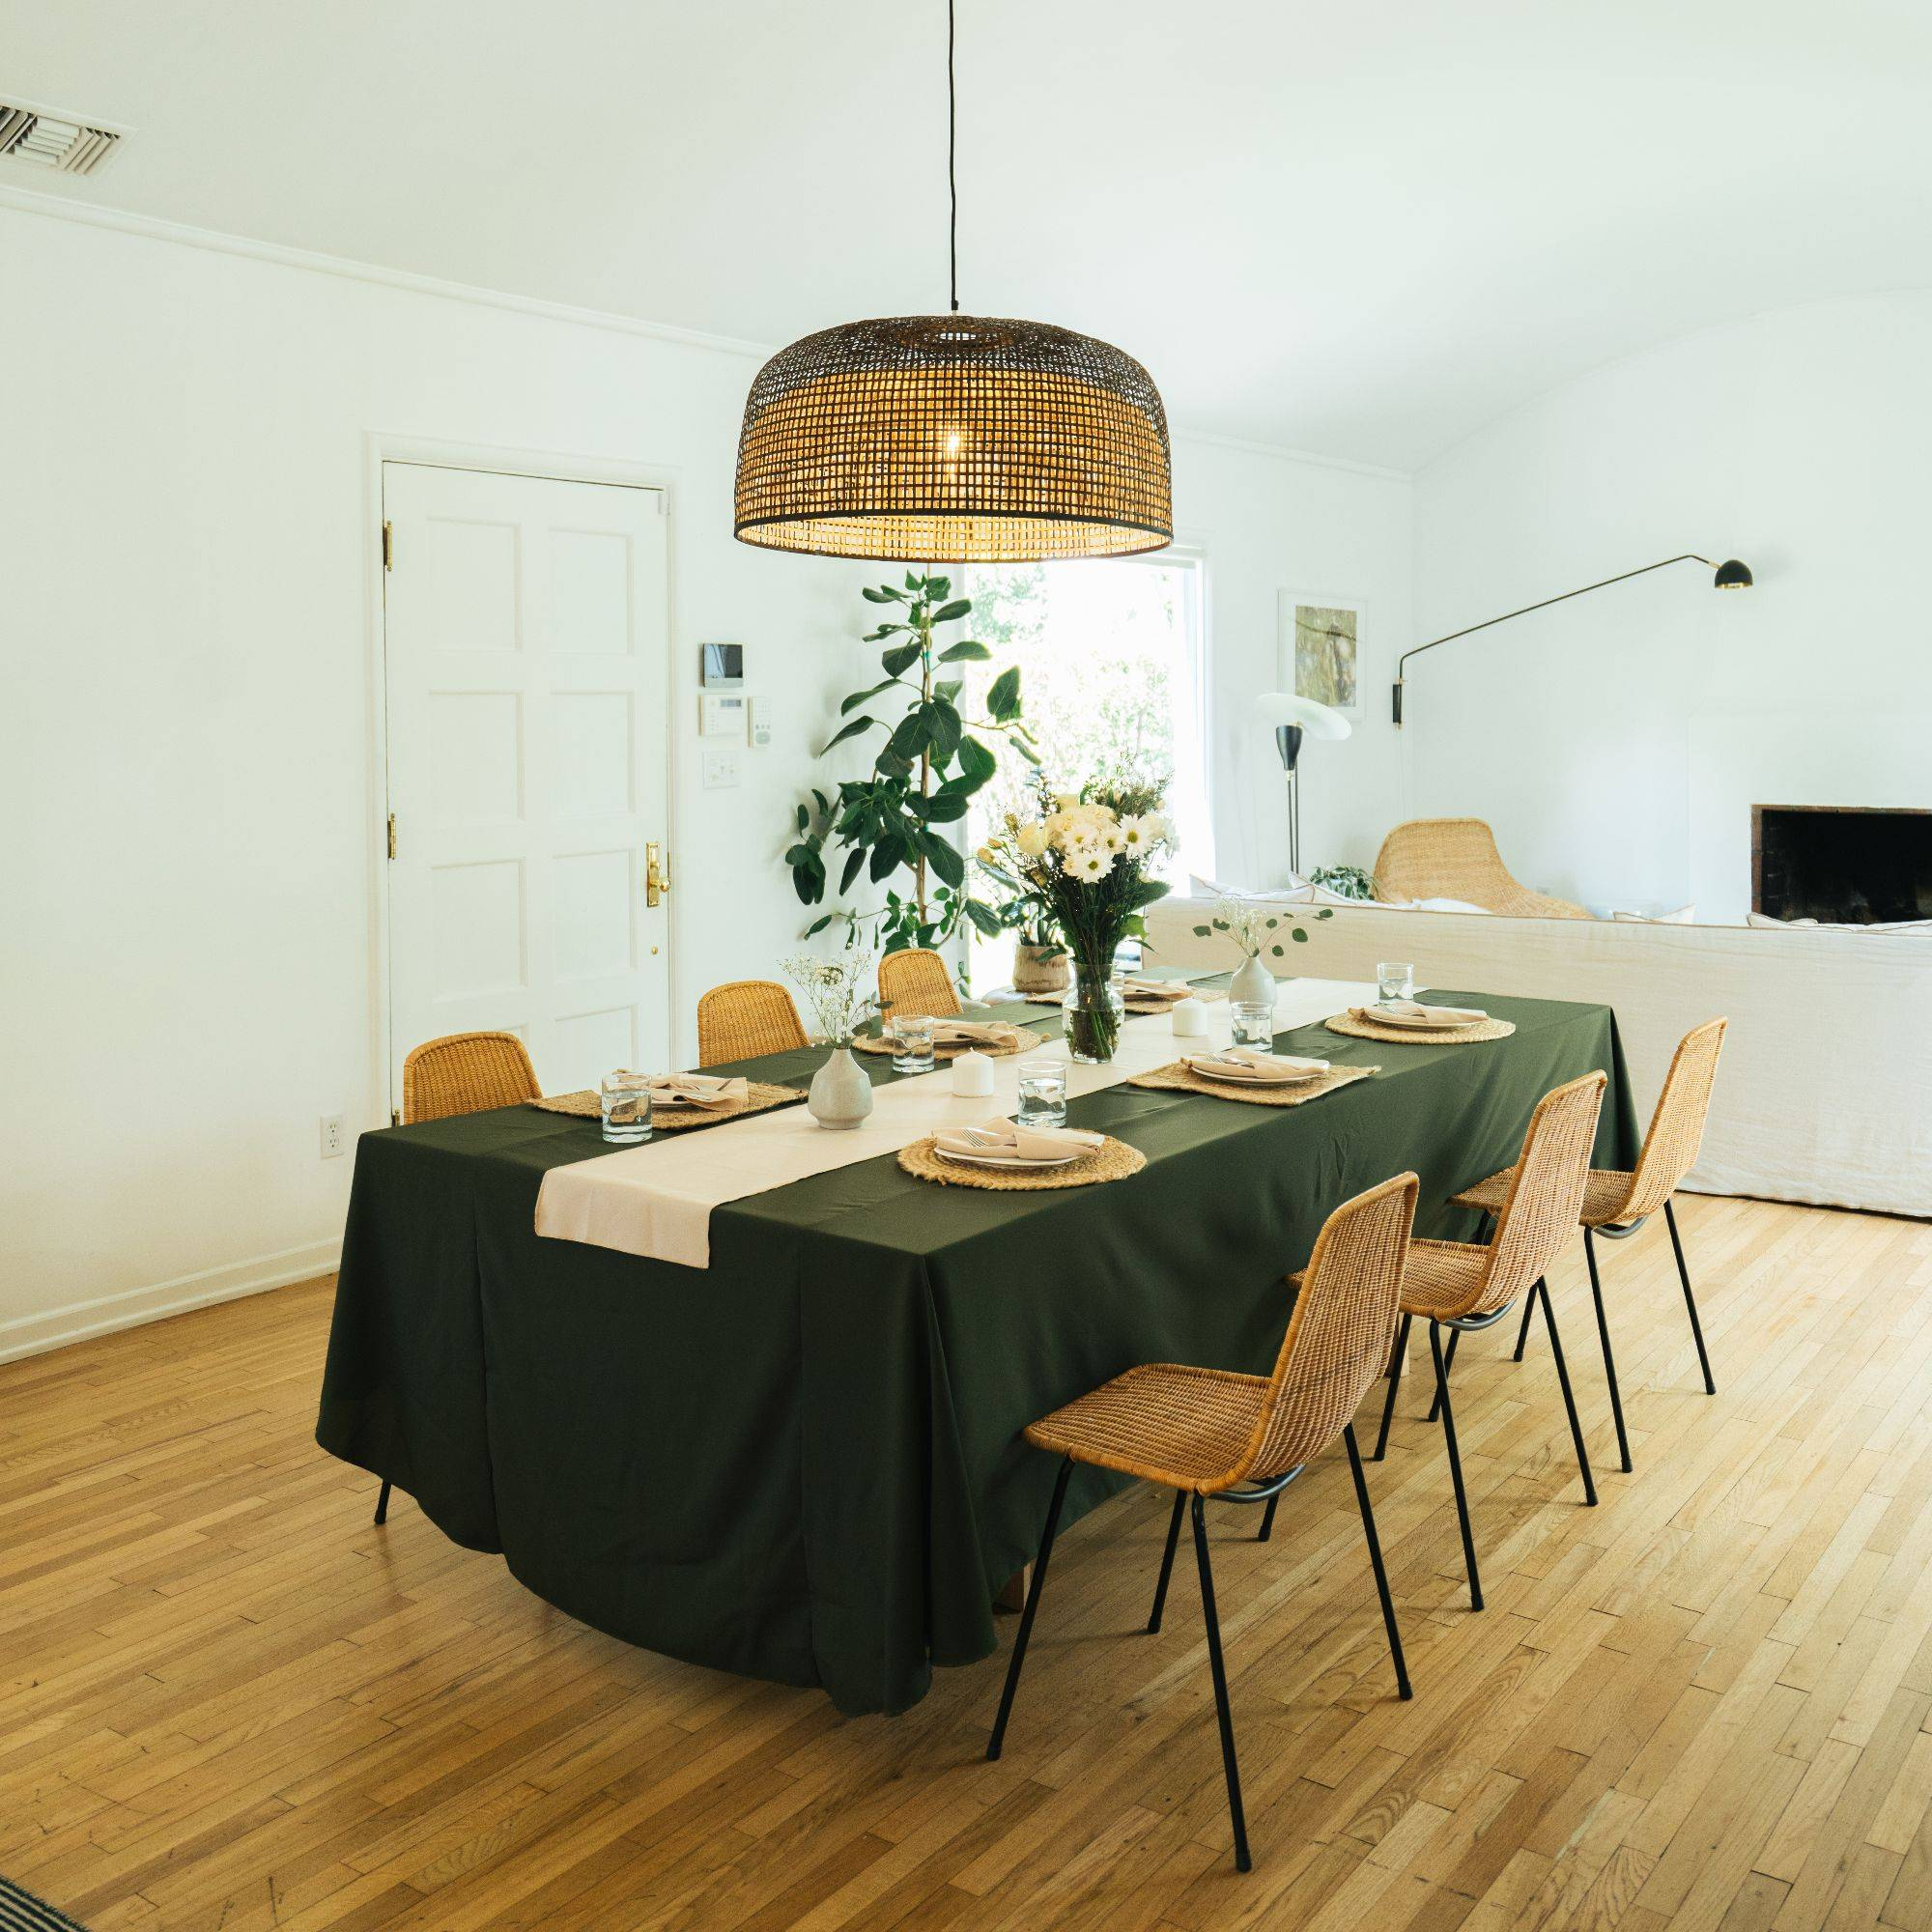 LA Linen Poplin Rectangular Tablecloth, Olive Color, Napkins, Table Runner, Khaki color, table set up, home decor, interior, dining